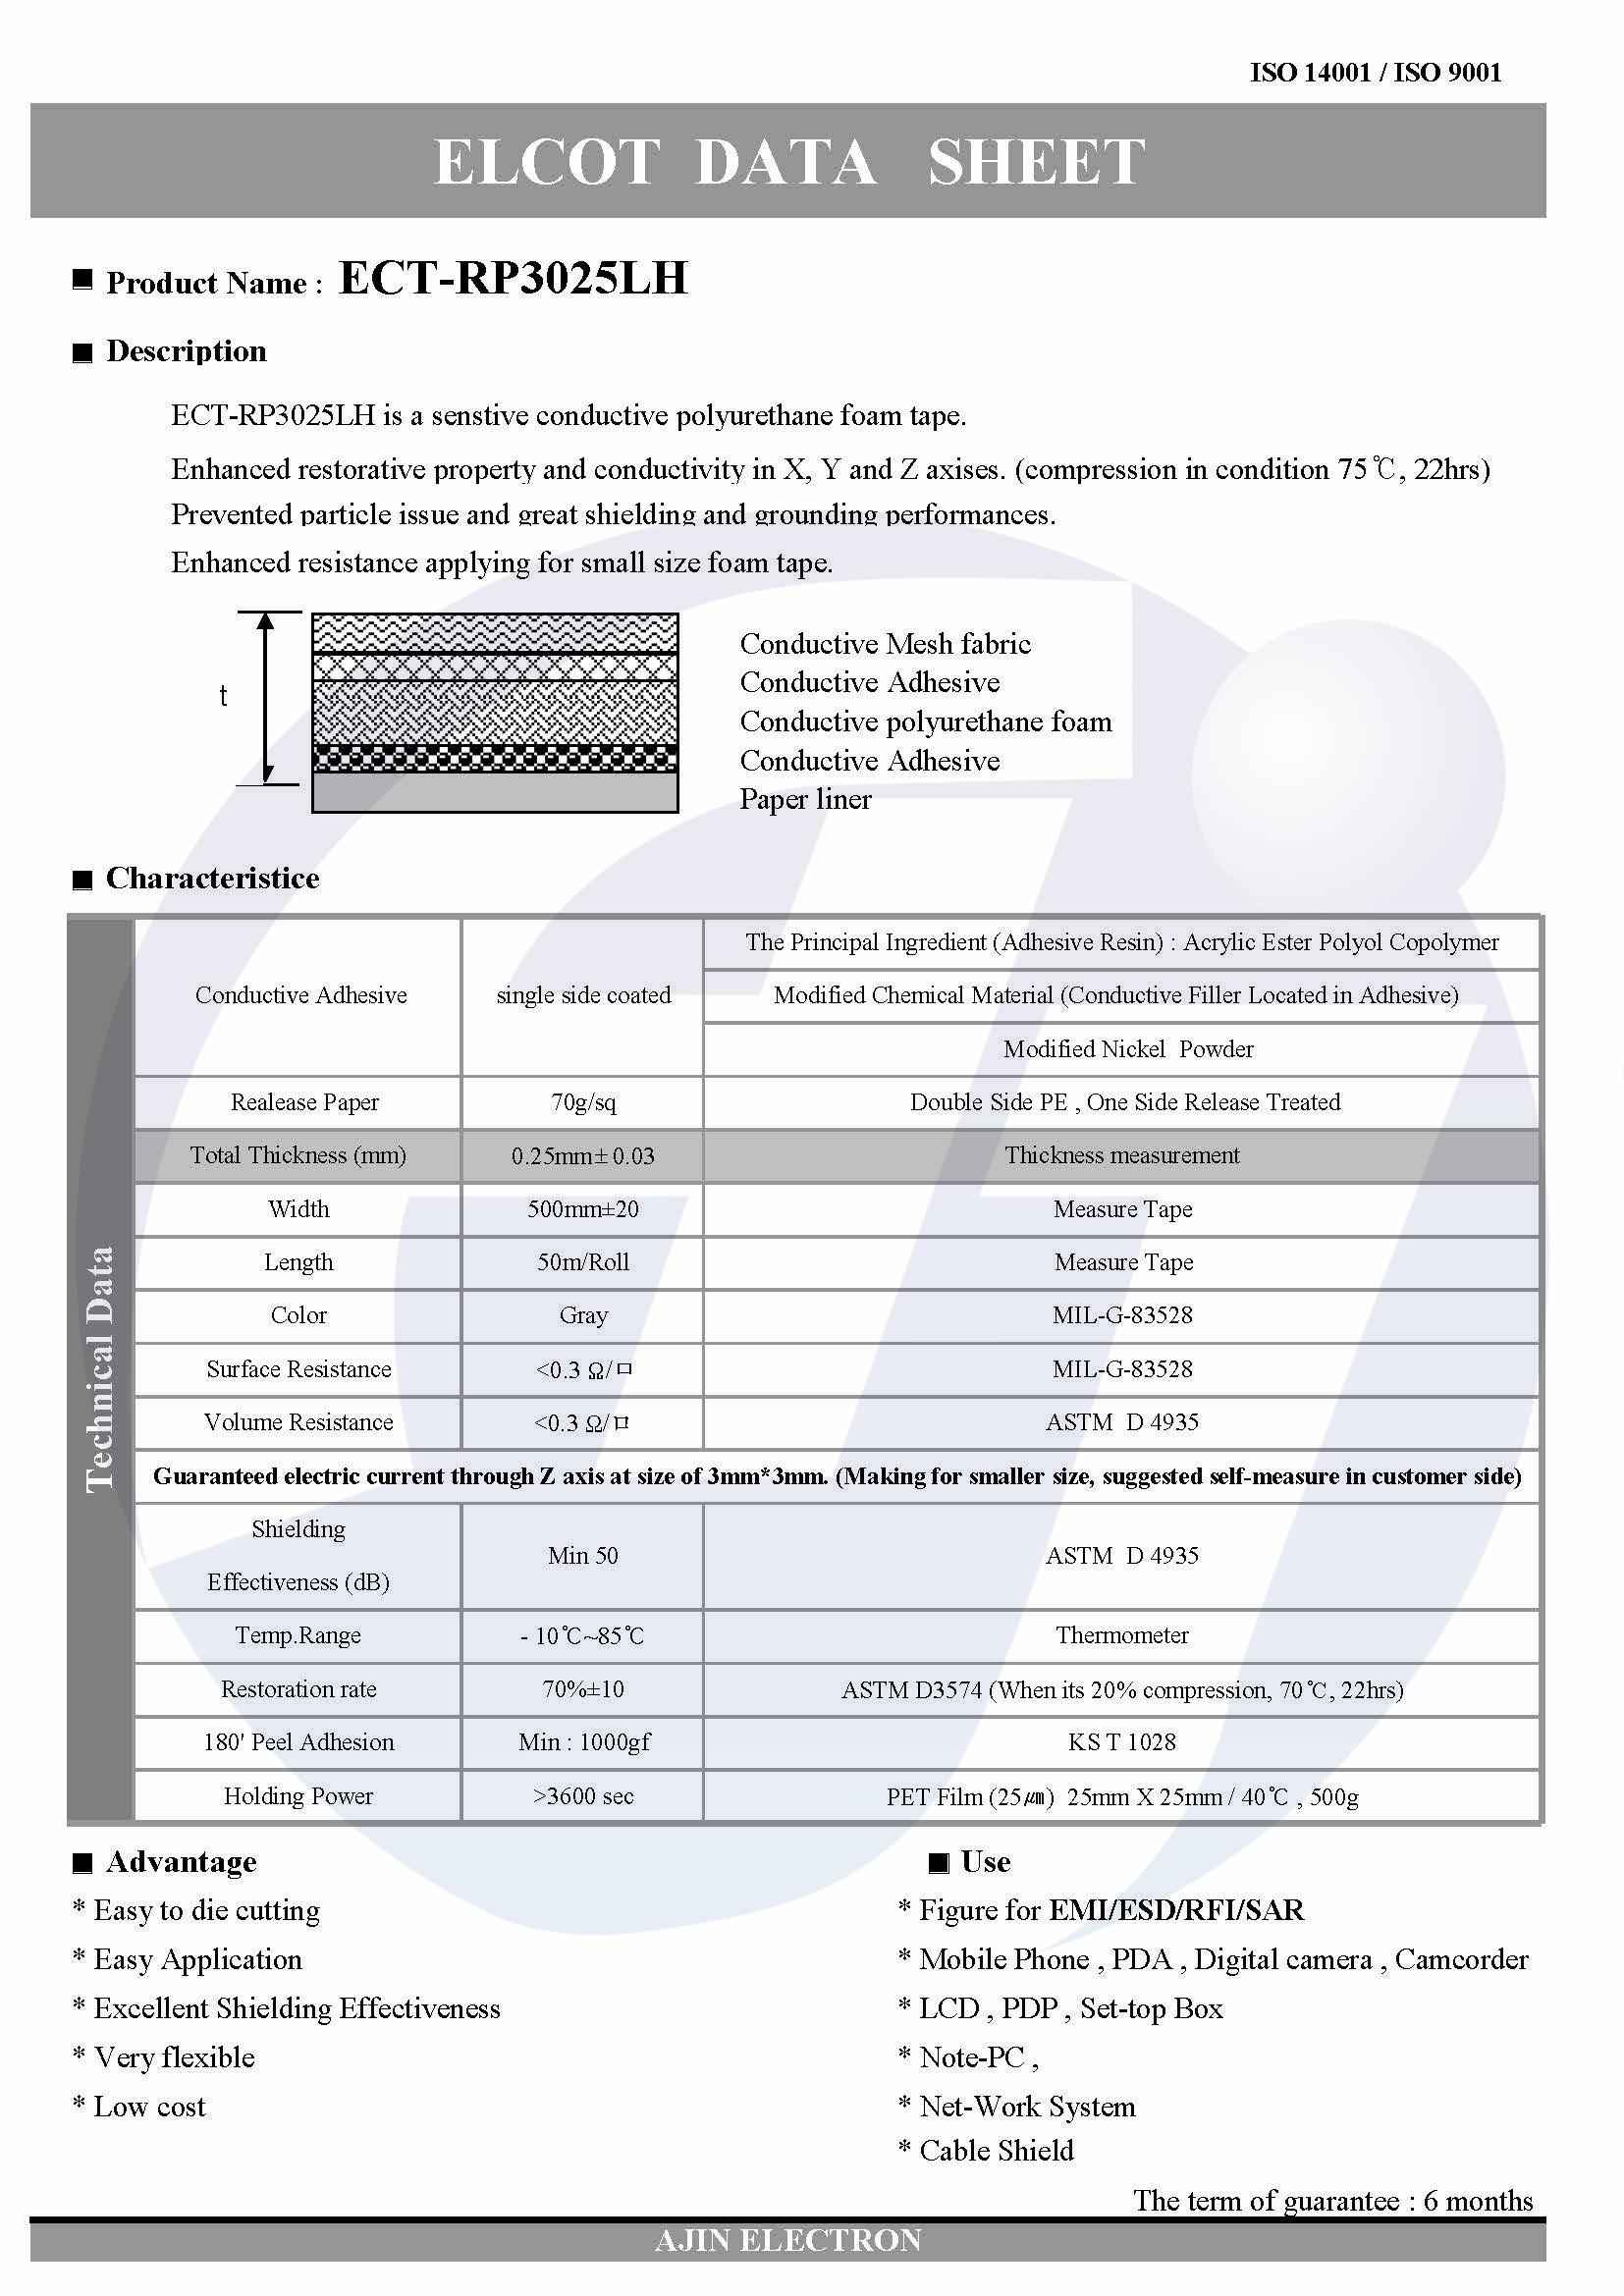 TDS(ECT-RP3025LH).jpg